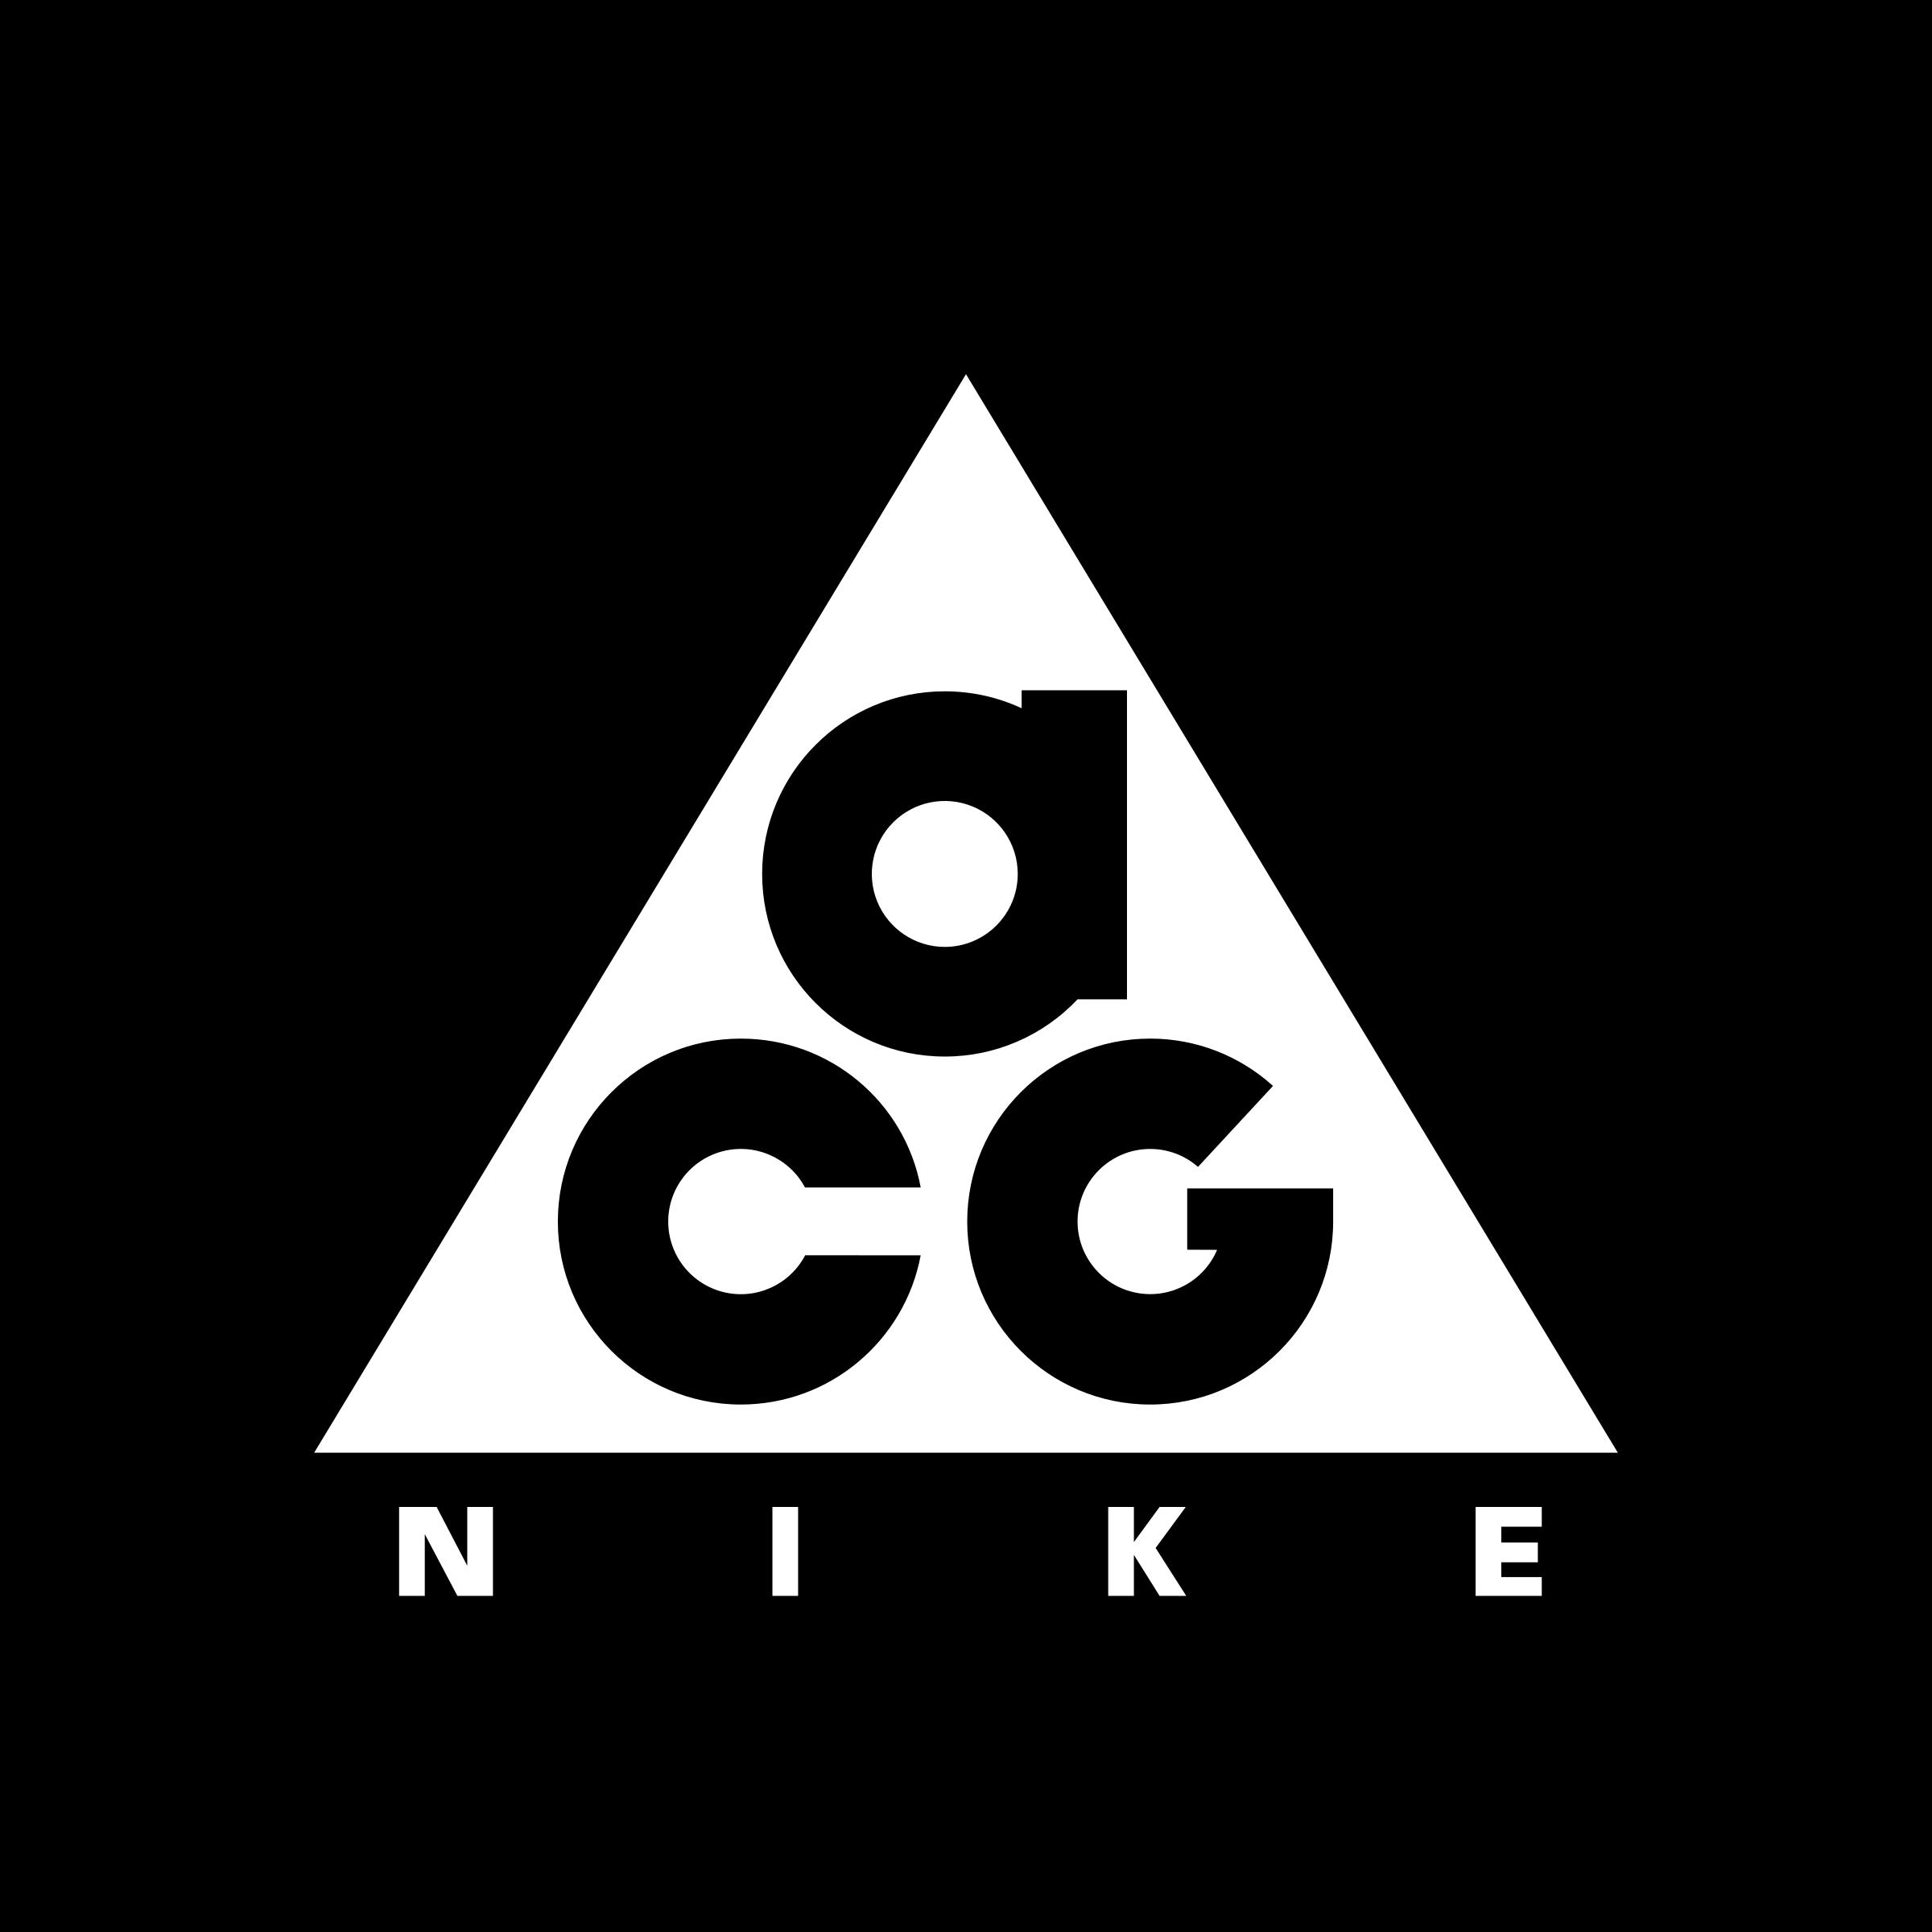 NIKE ACG LOGO Nike acg, Lab logo, Acg